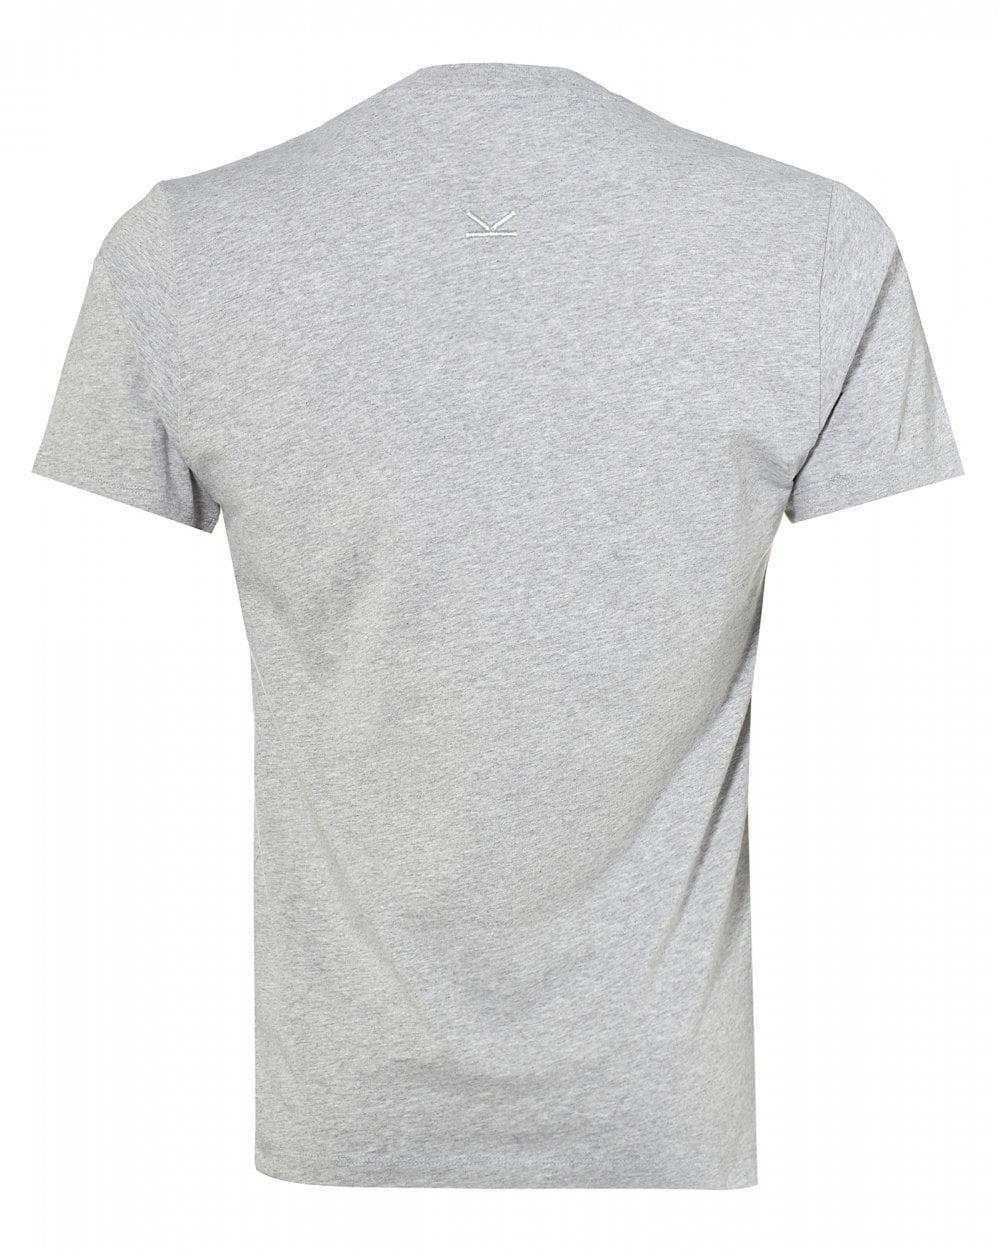 6444a46b90c KENZO Classic Logo T-shirt, Pearl Grey Tee in Gray for Men - Lyst